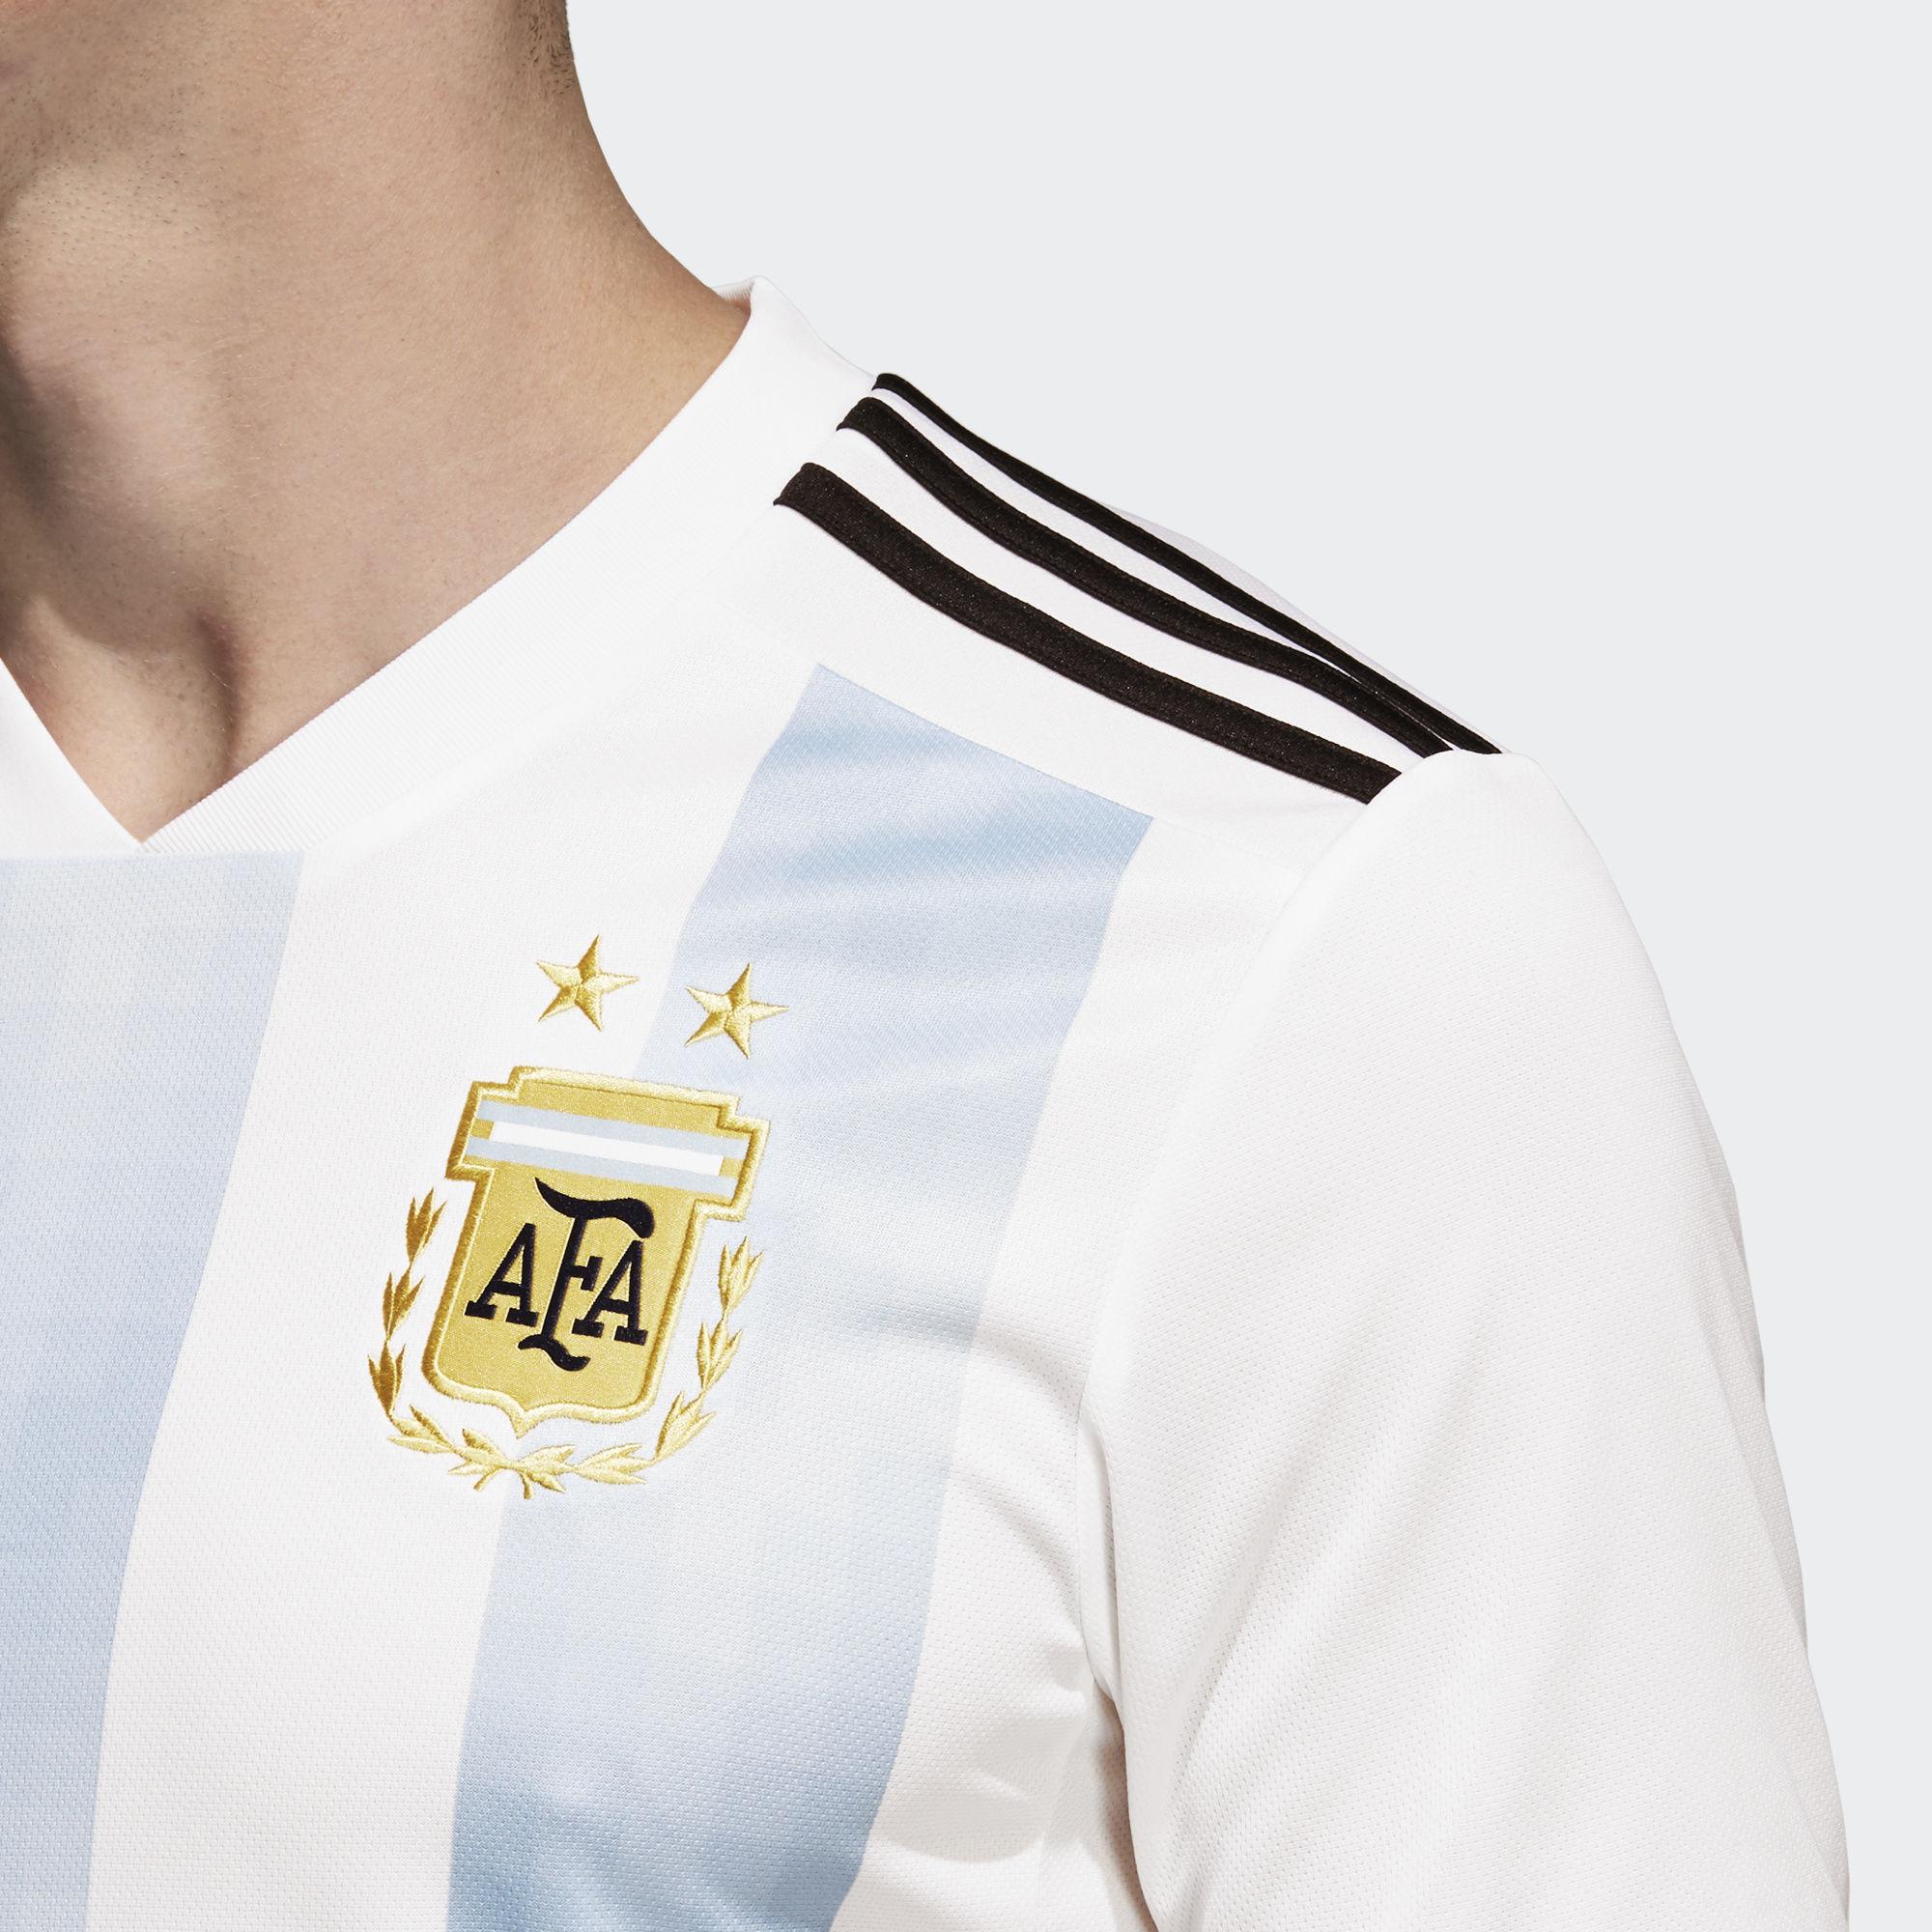 Argentina 2018 World Cup Adidas Home Kit | 17/18 Kits | Football